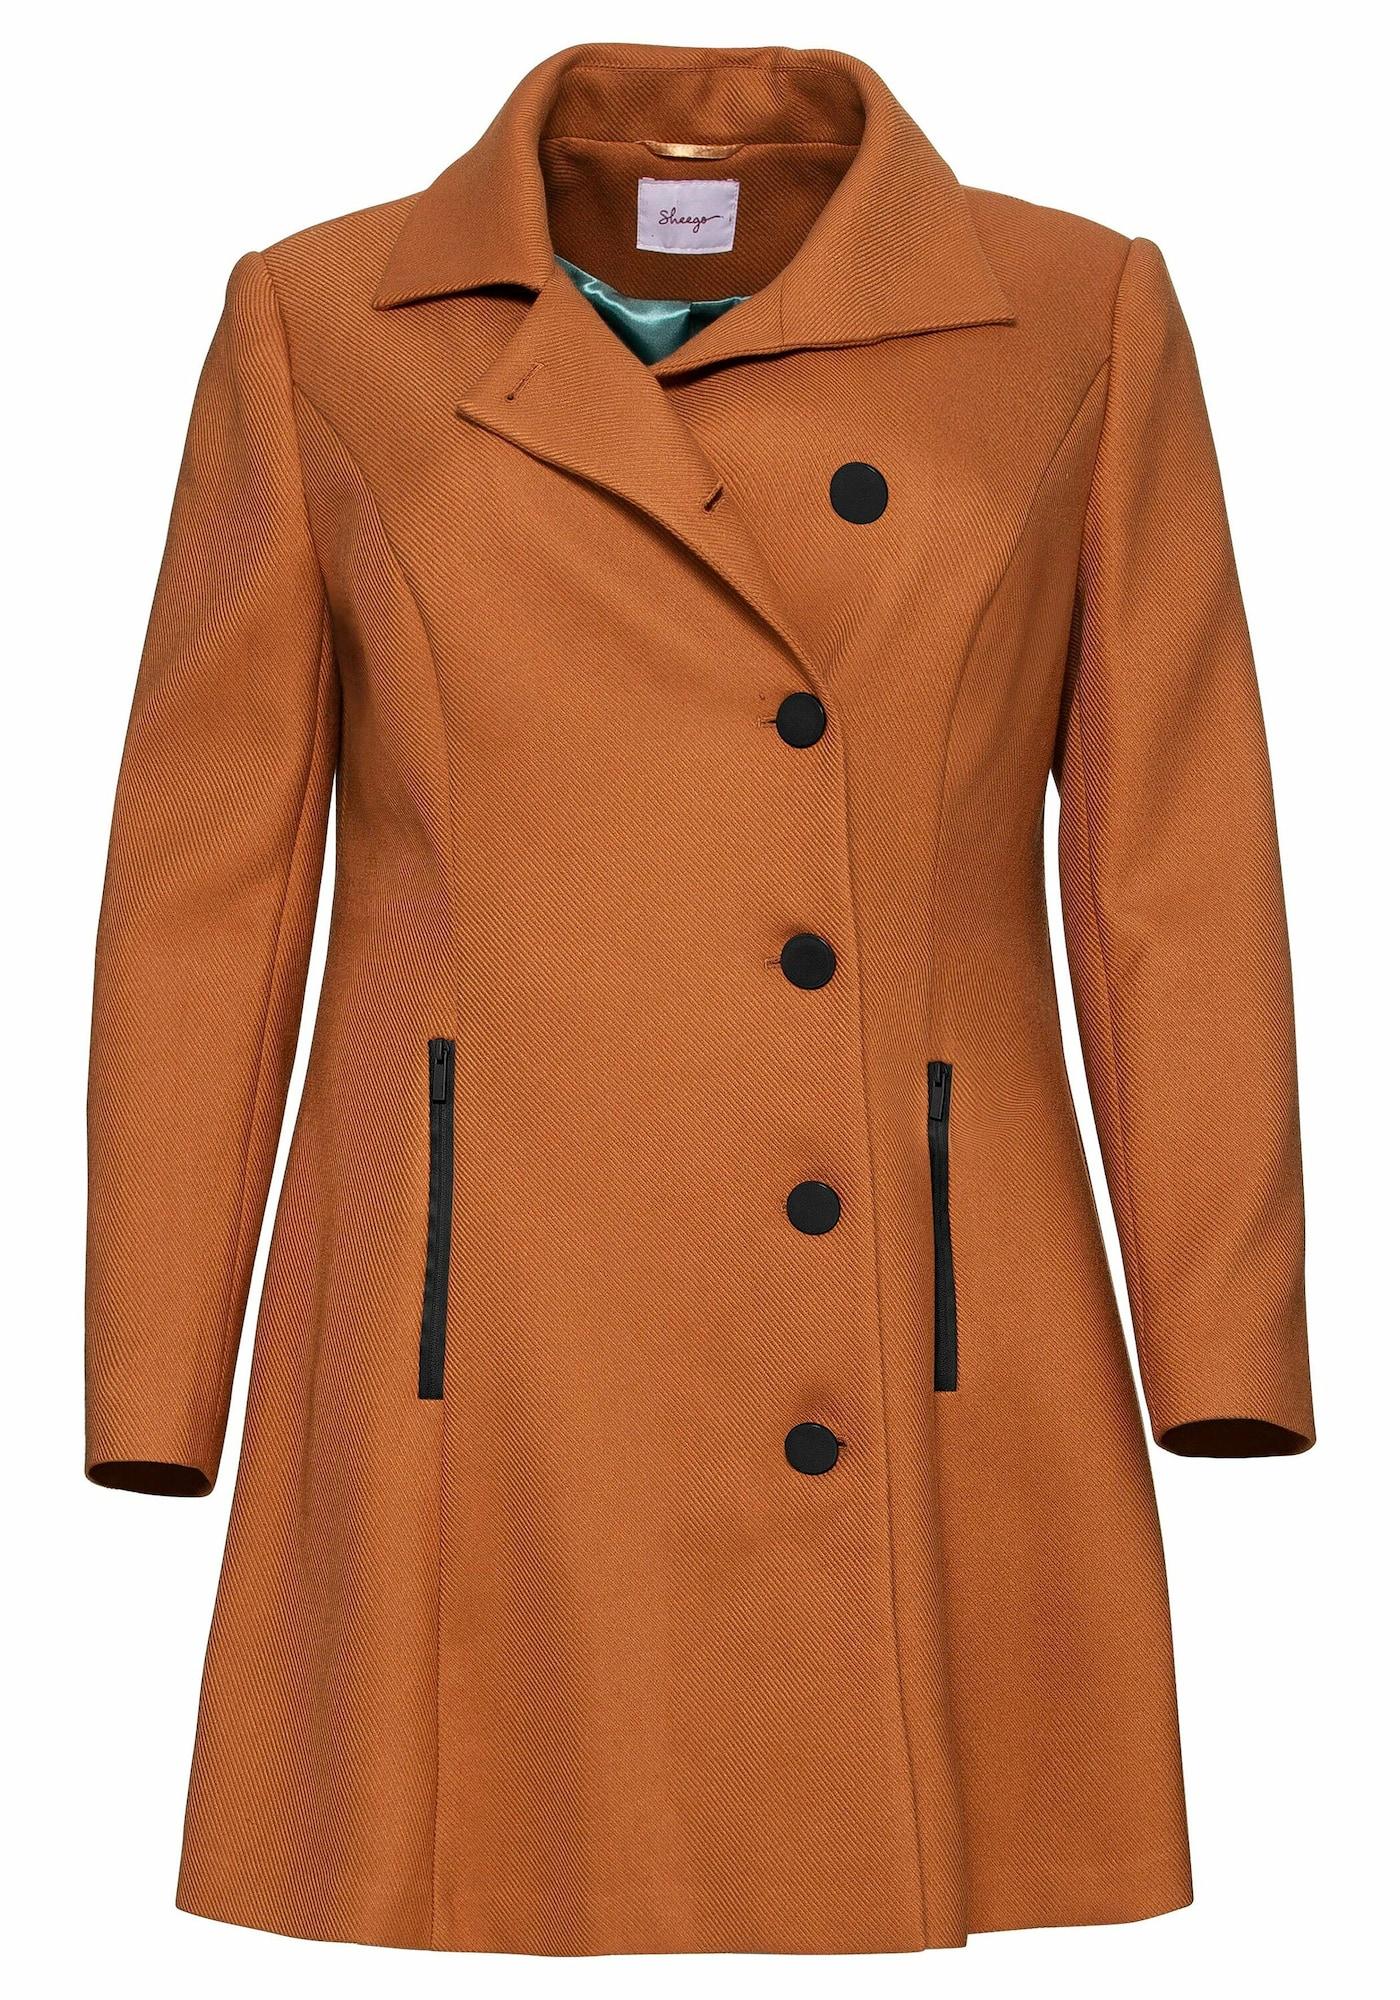 SHEEGO Demisezoninis paltas ruda (konjako)